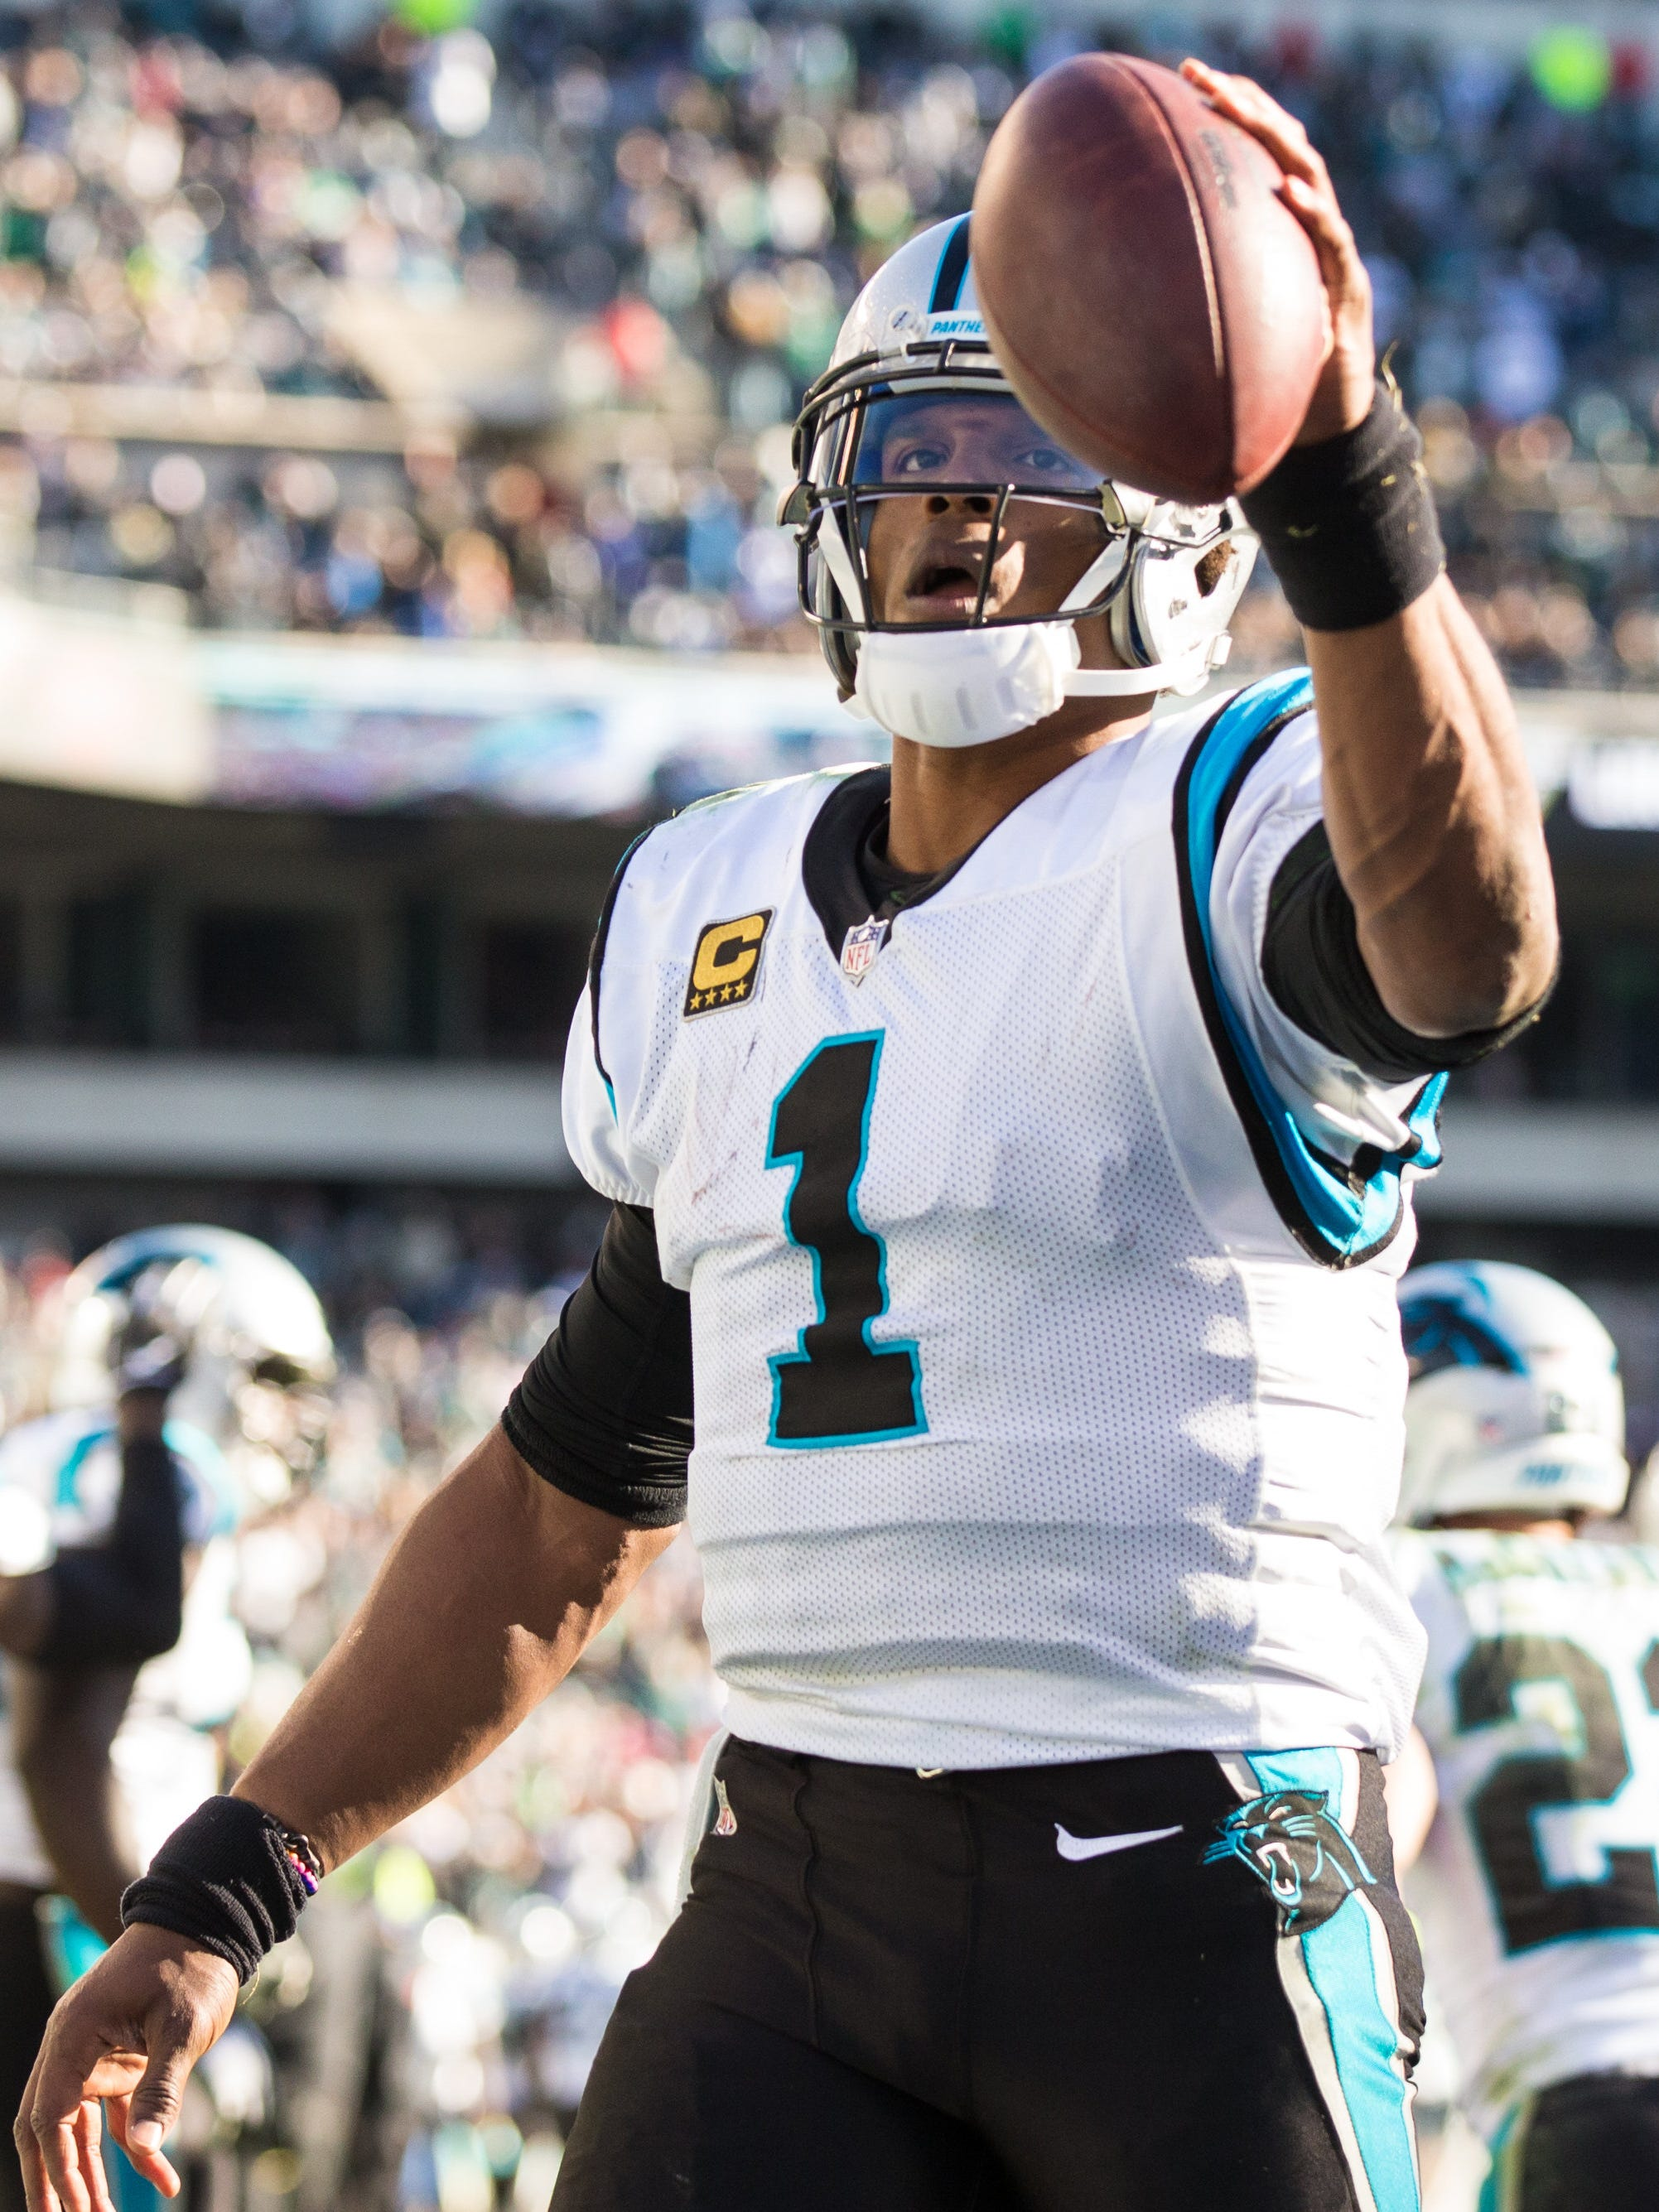 Cam Newton celebrates his touchdown pass to tight end Greg Olsen against the Eagles.